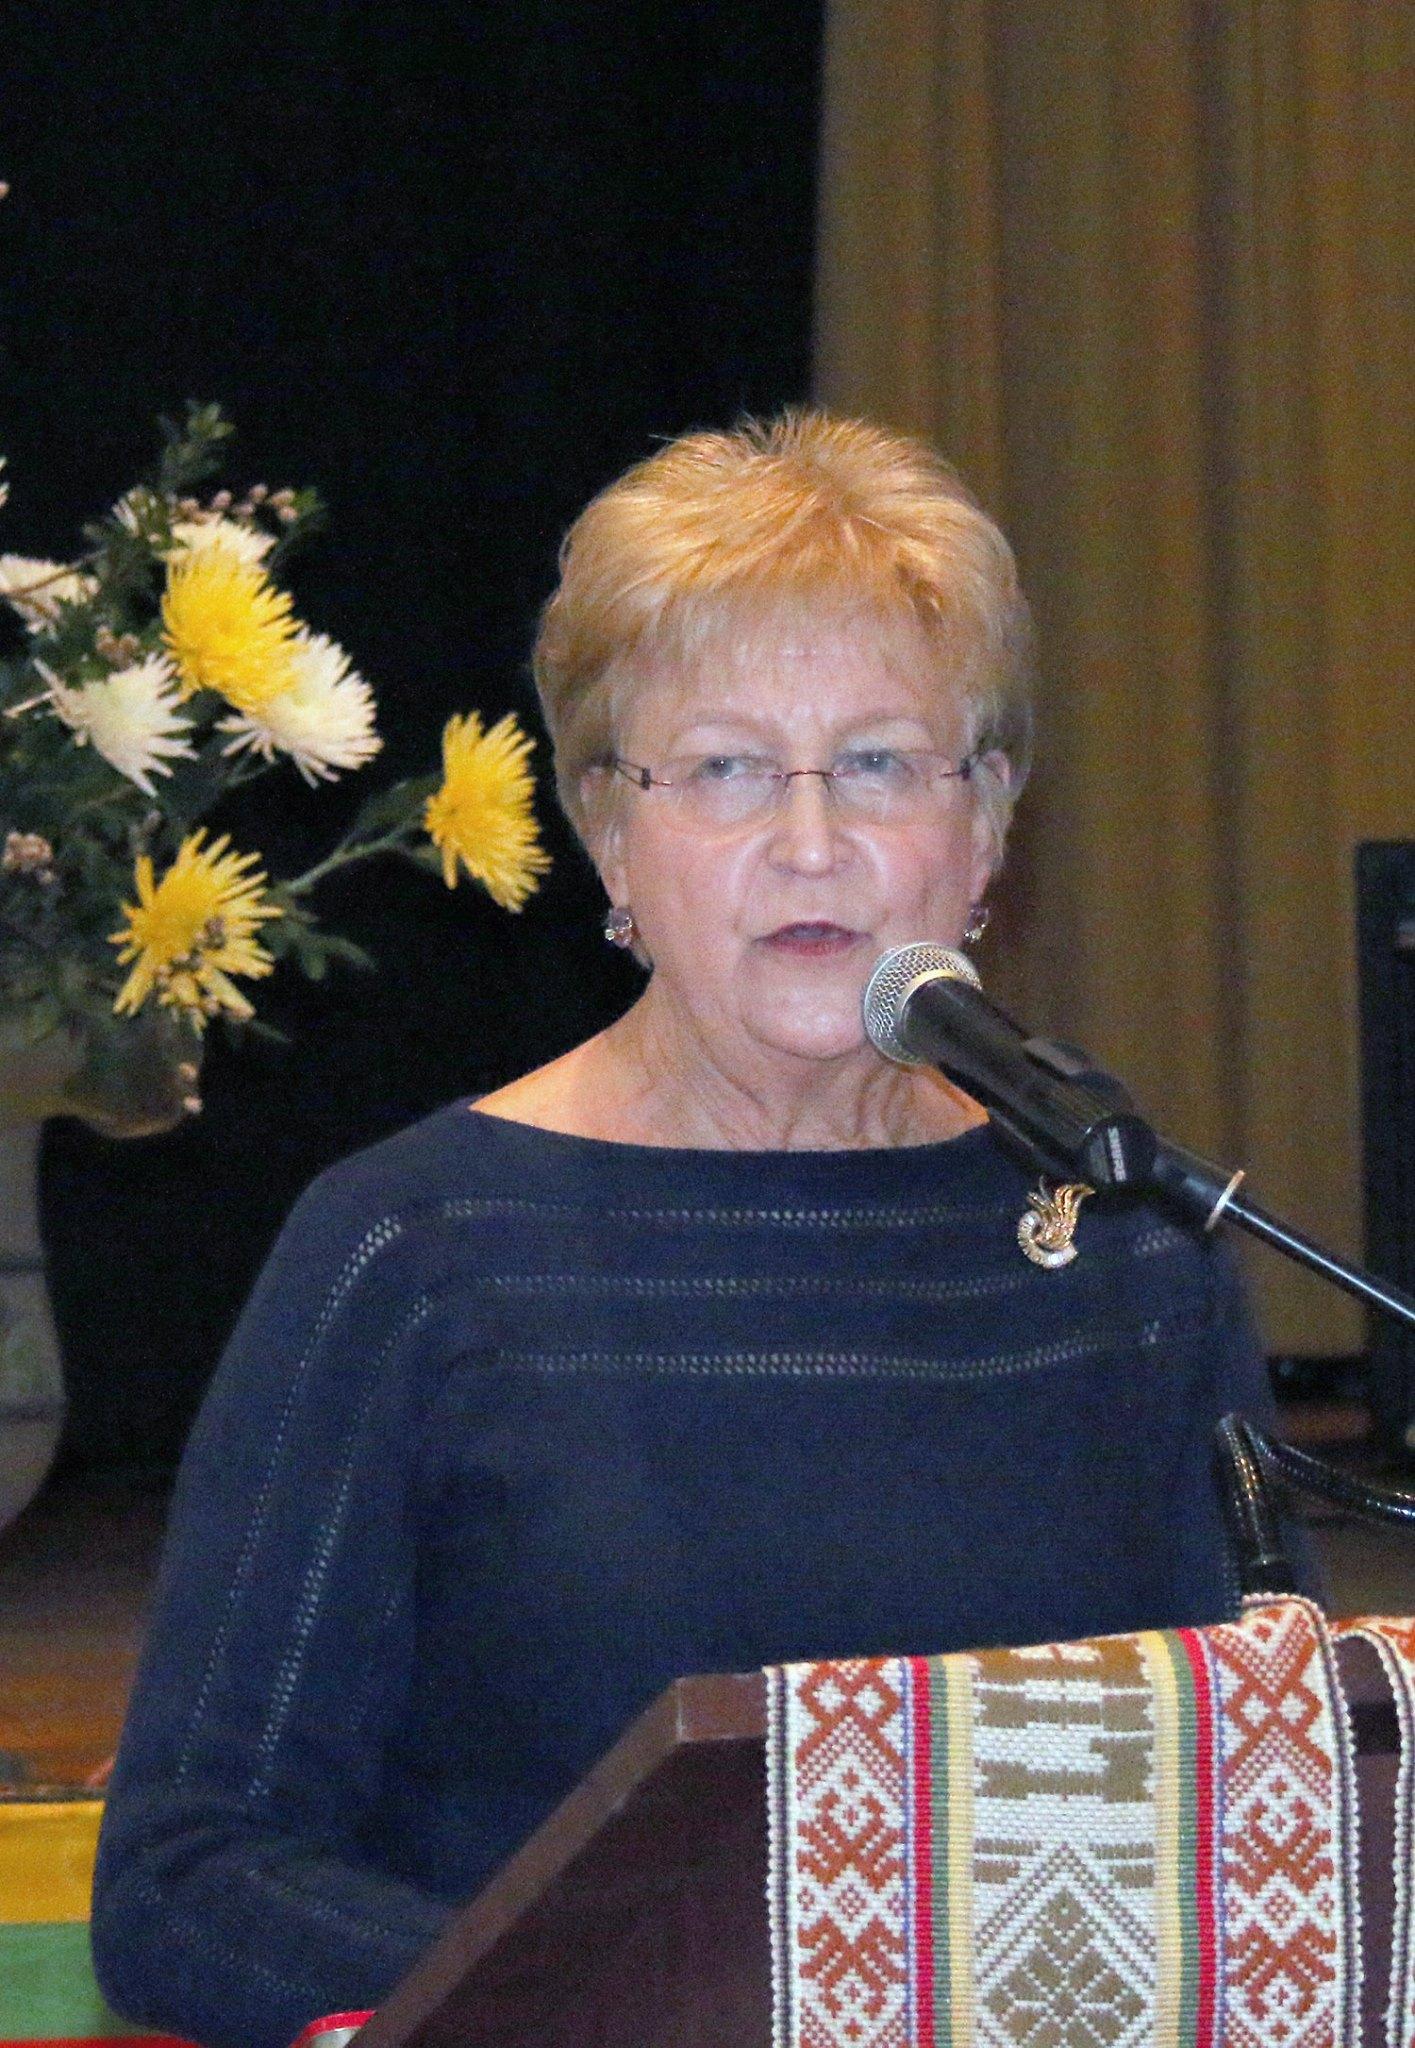 Janina Udriene